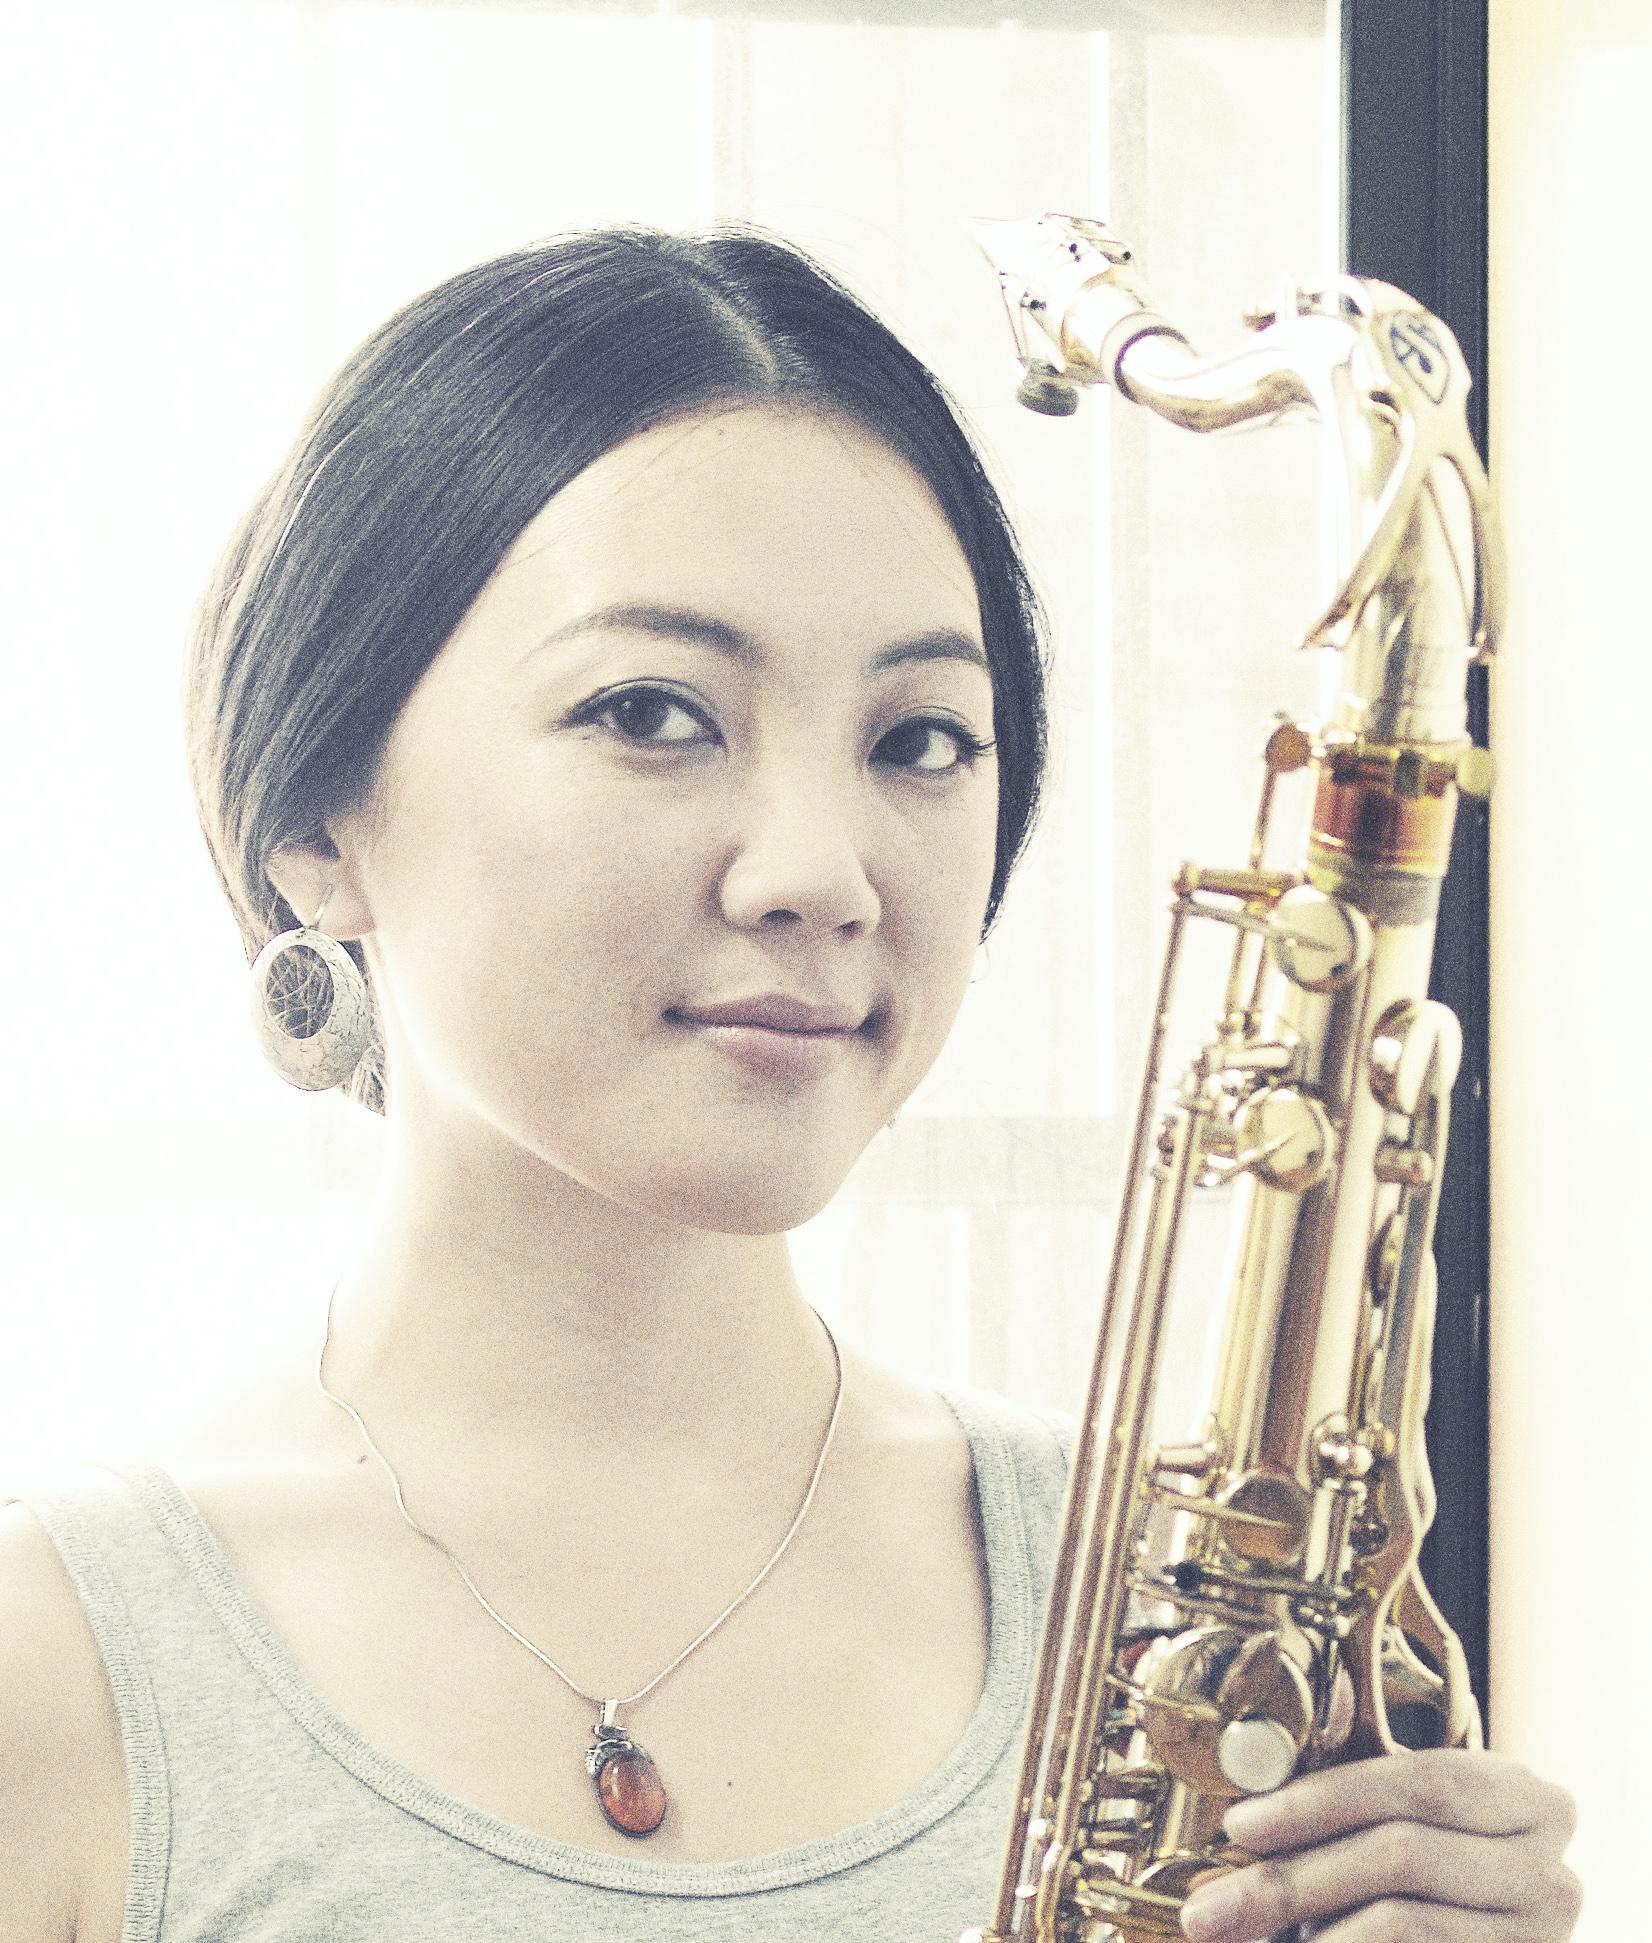 Hitomi Oba